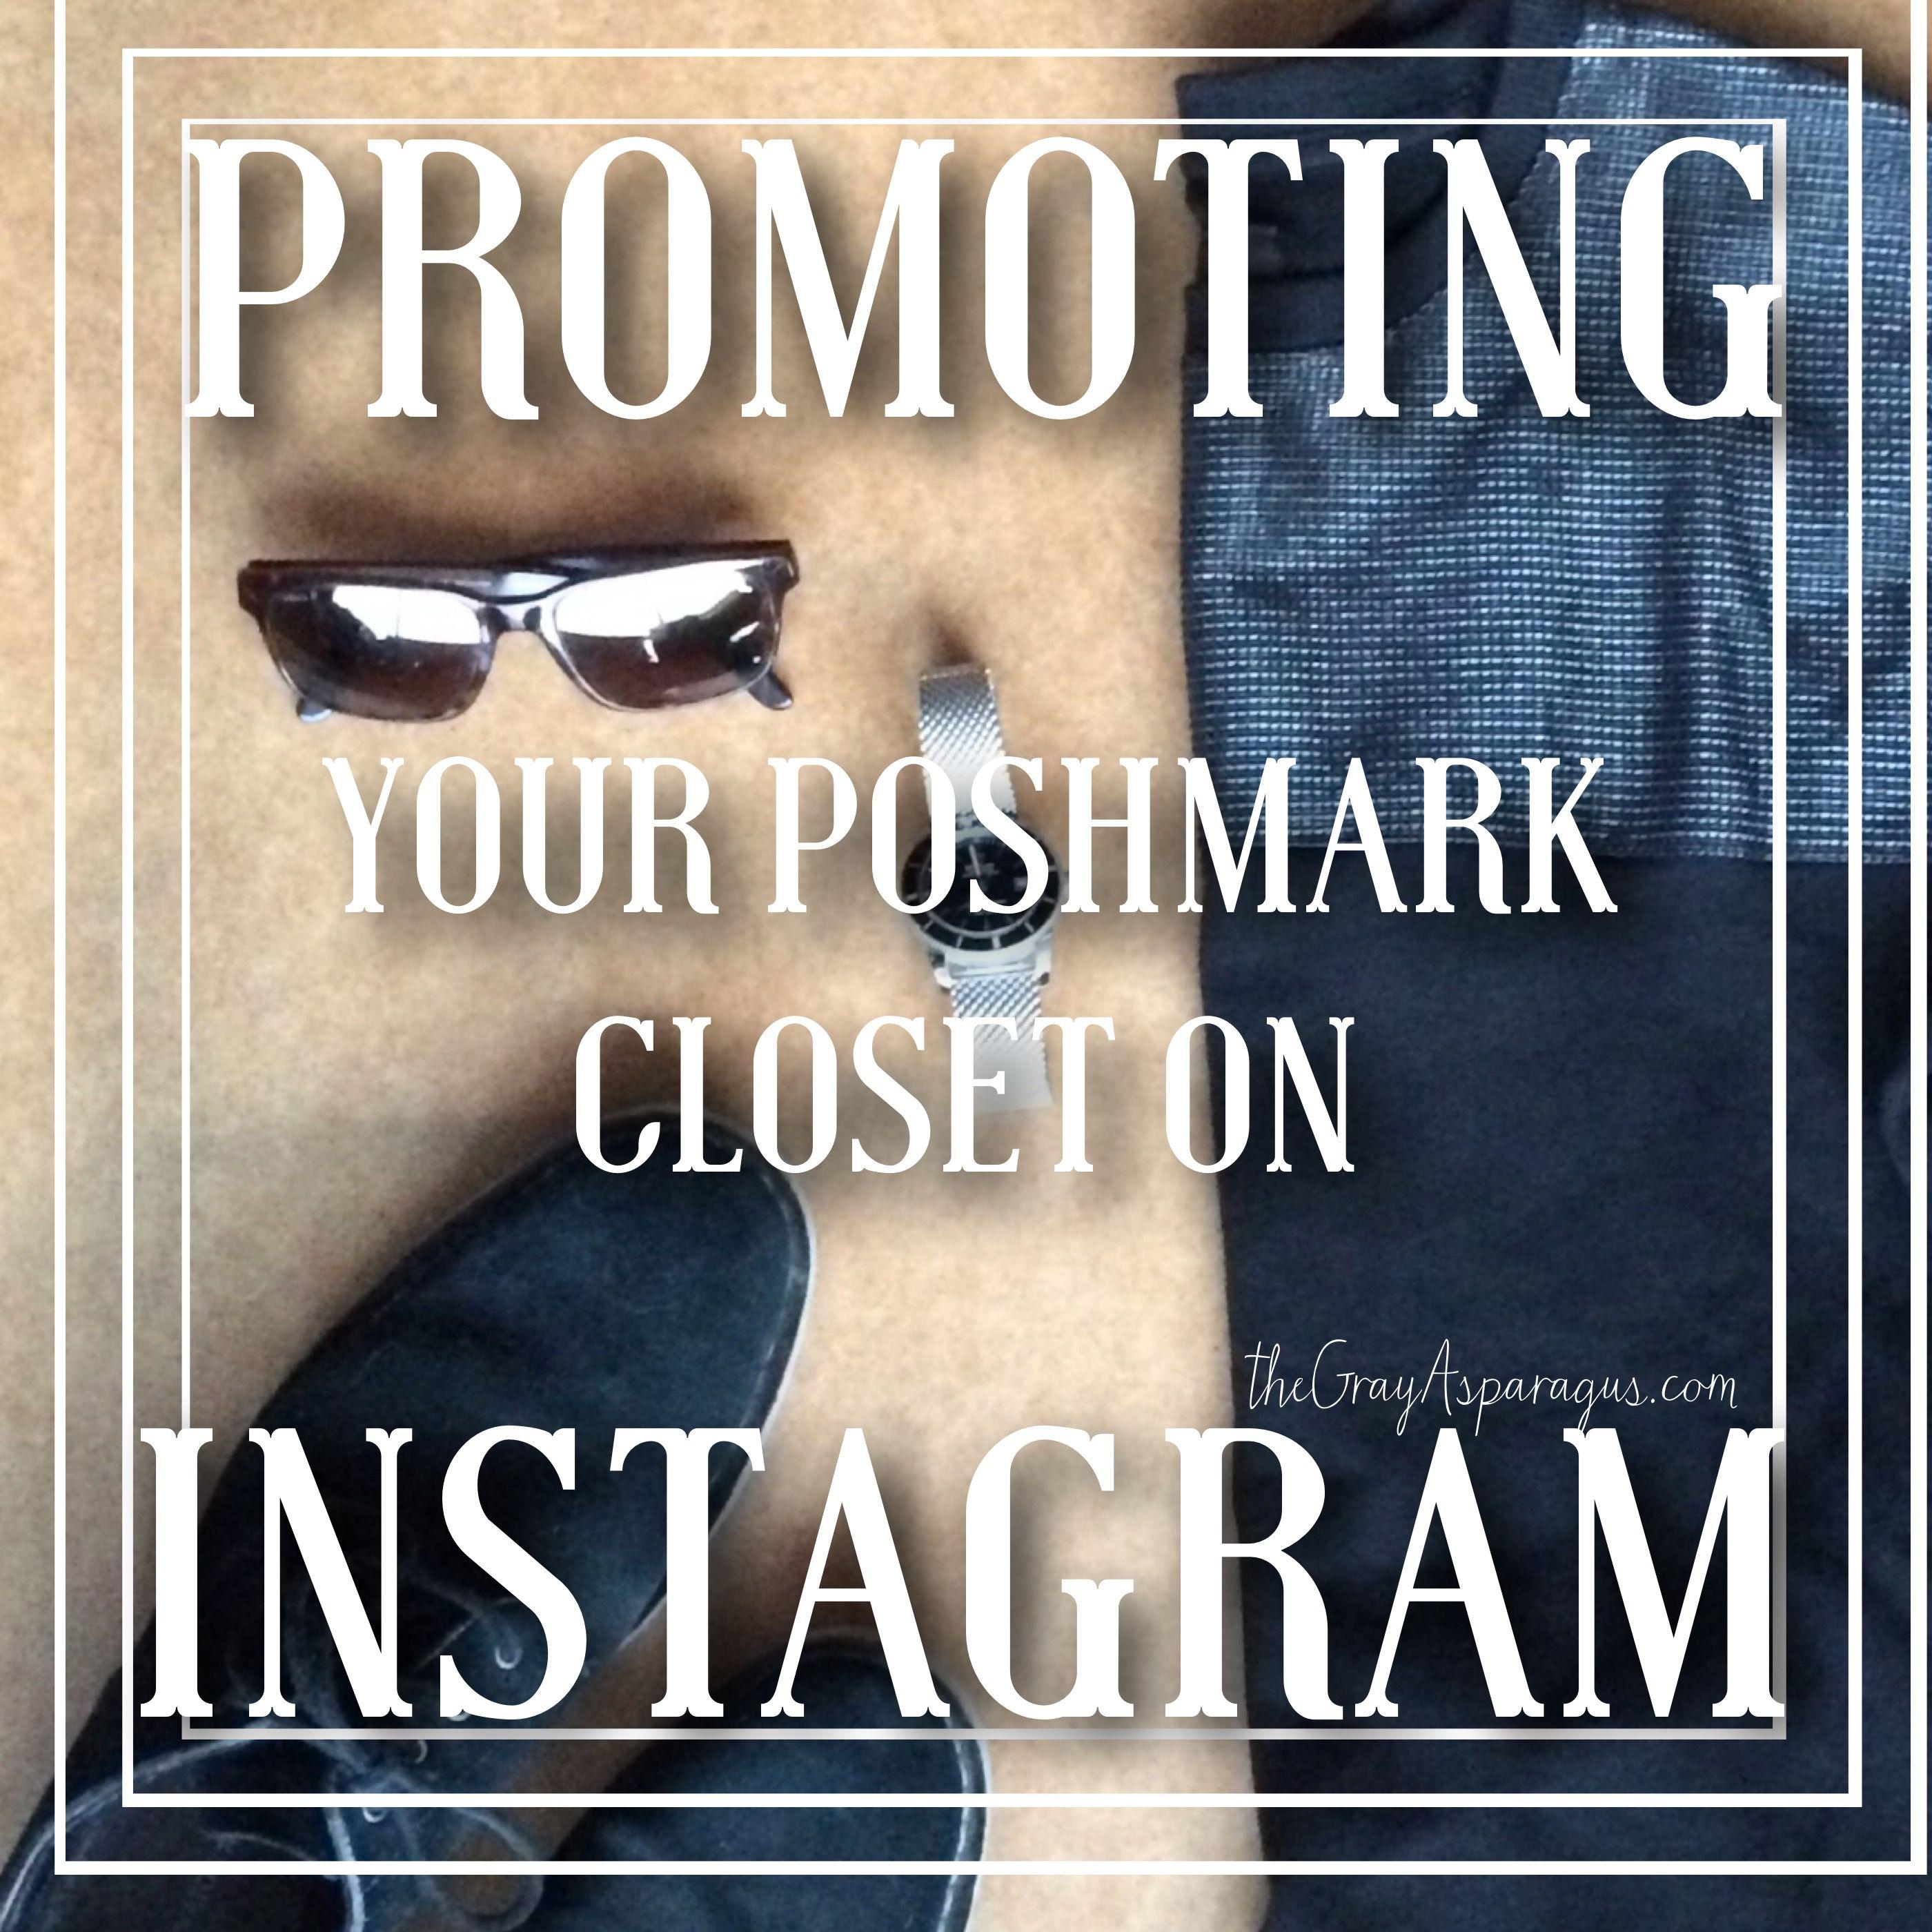 Promoting Your Poshmark Closet on Instagram - Poshmark